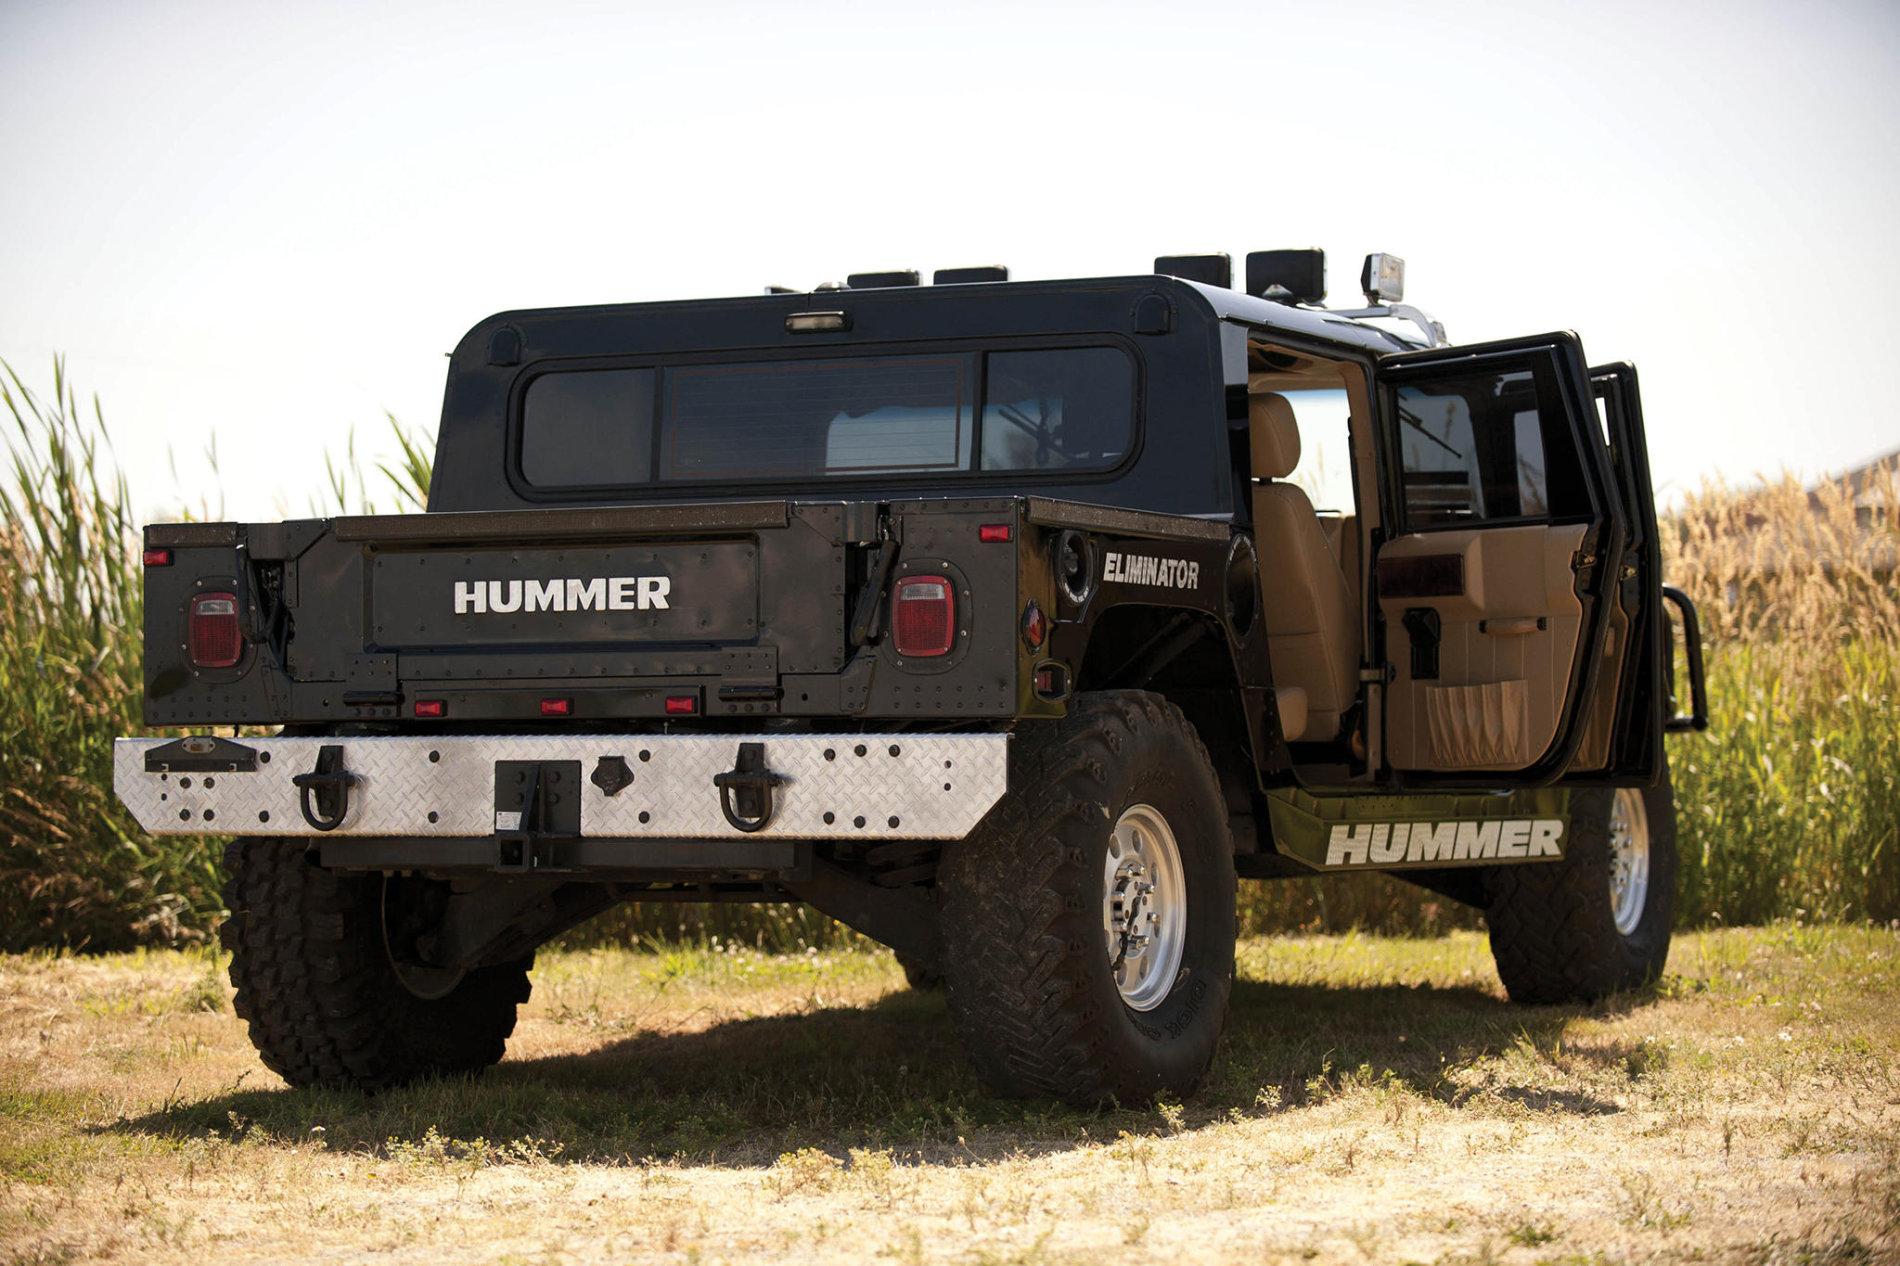 Hummer H1 detinut de Tupac Shakur - Hummer H1 detinut de Tupac Shakur